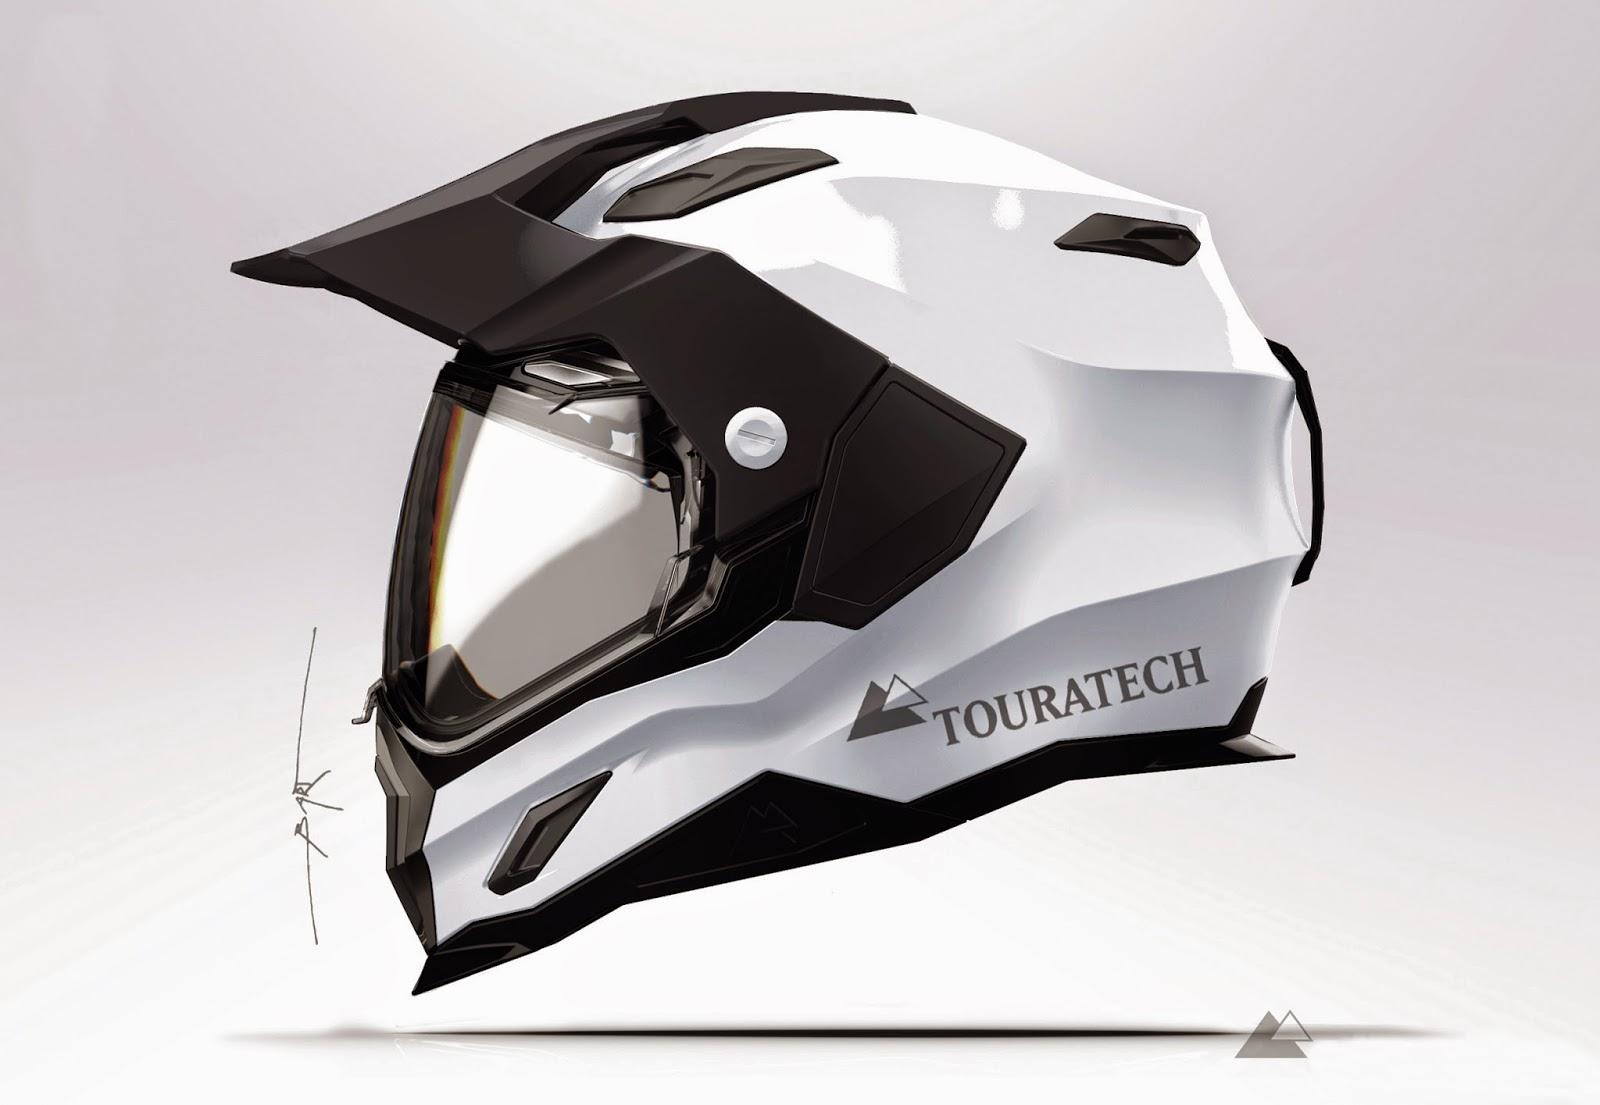 Nová ultra-lehká přilba Touratech Aventuro Carbon aaed1c6048